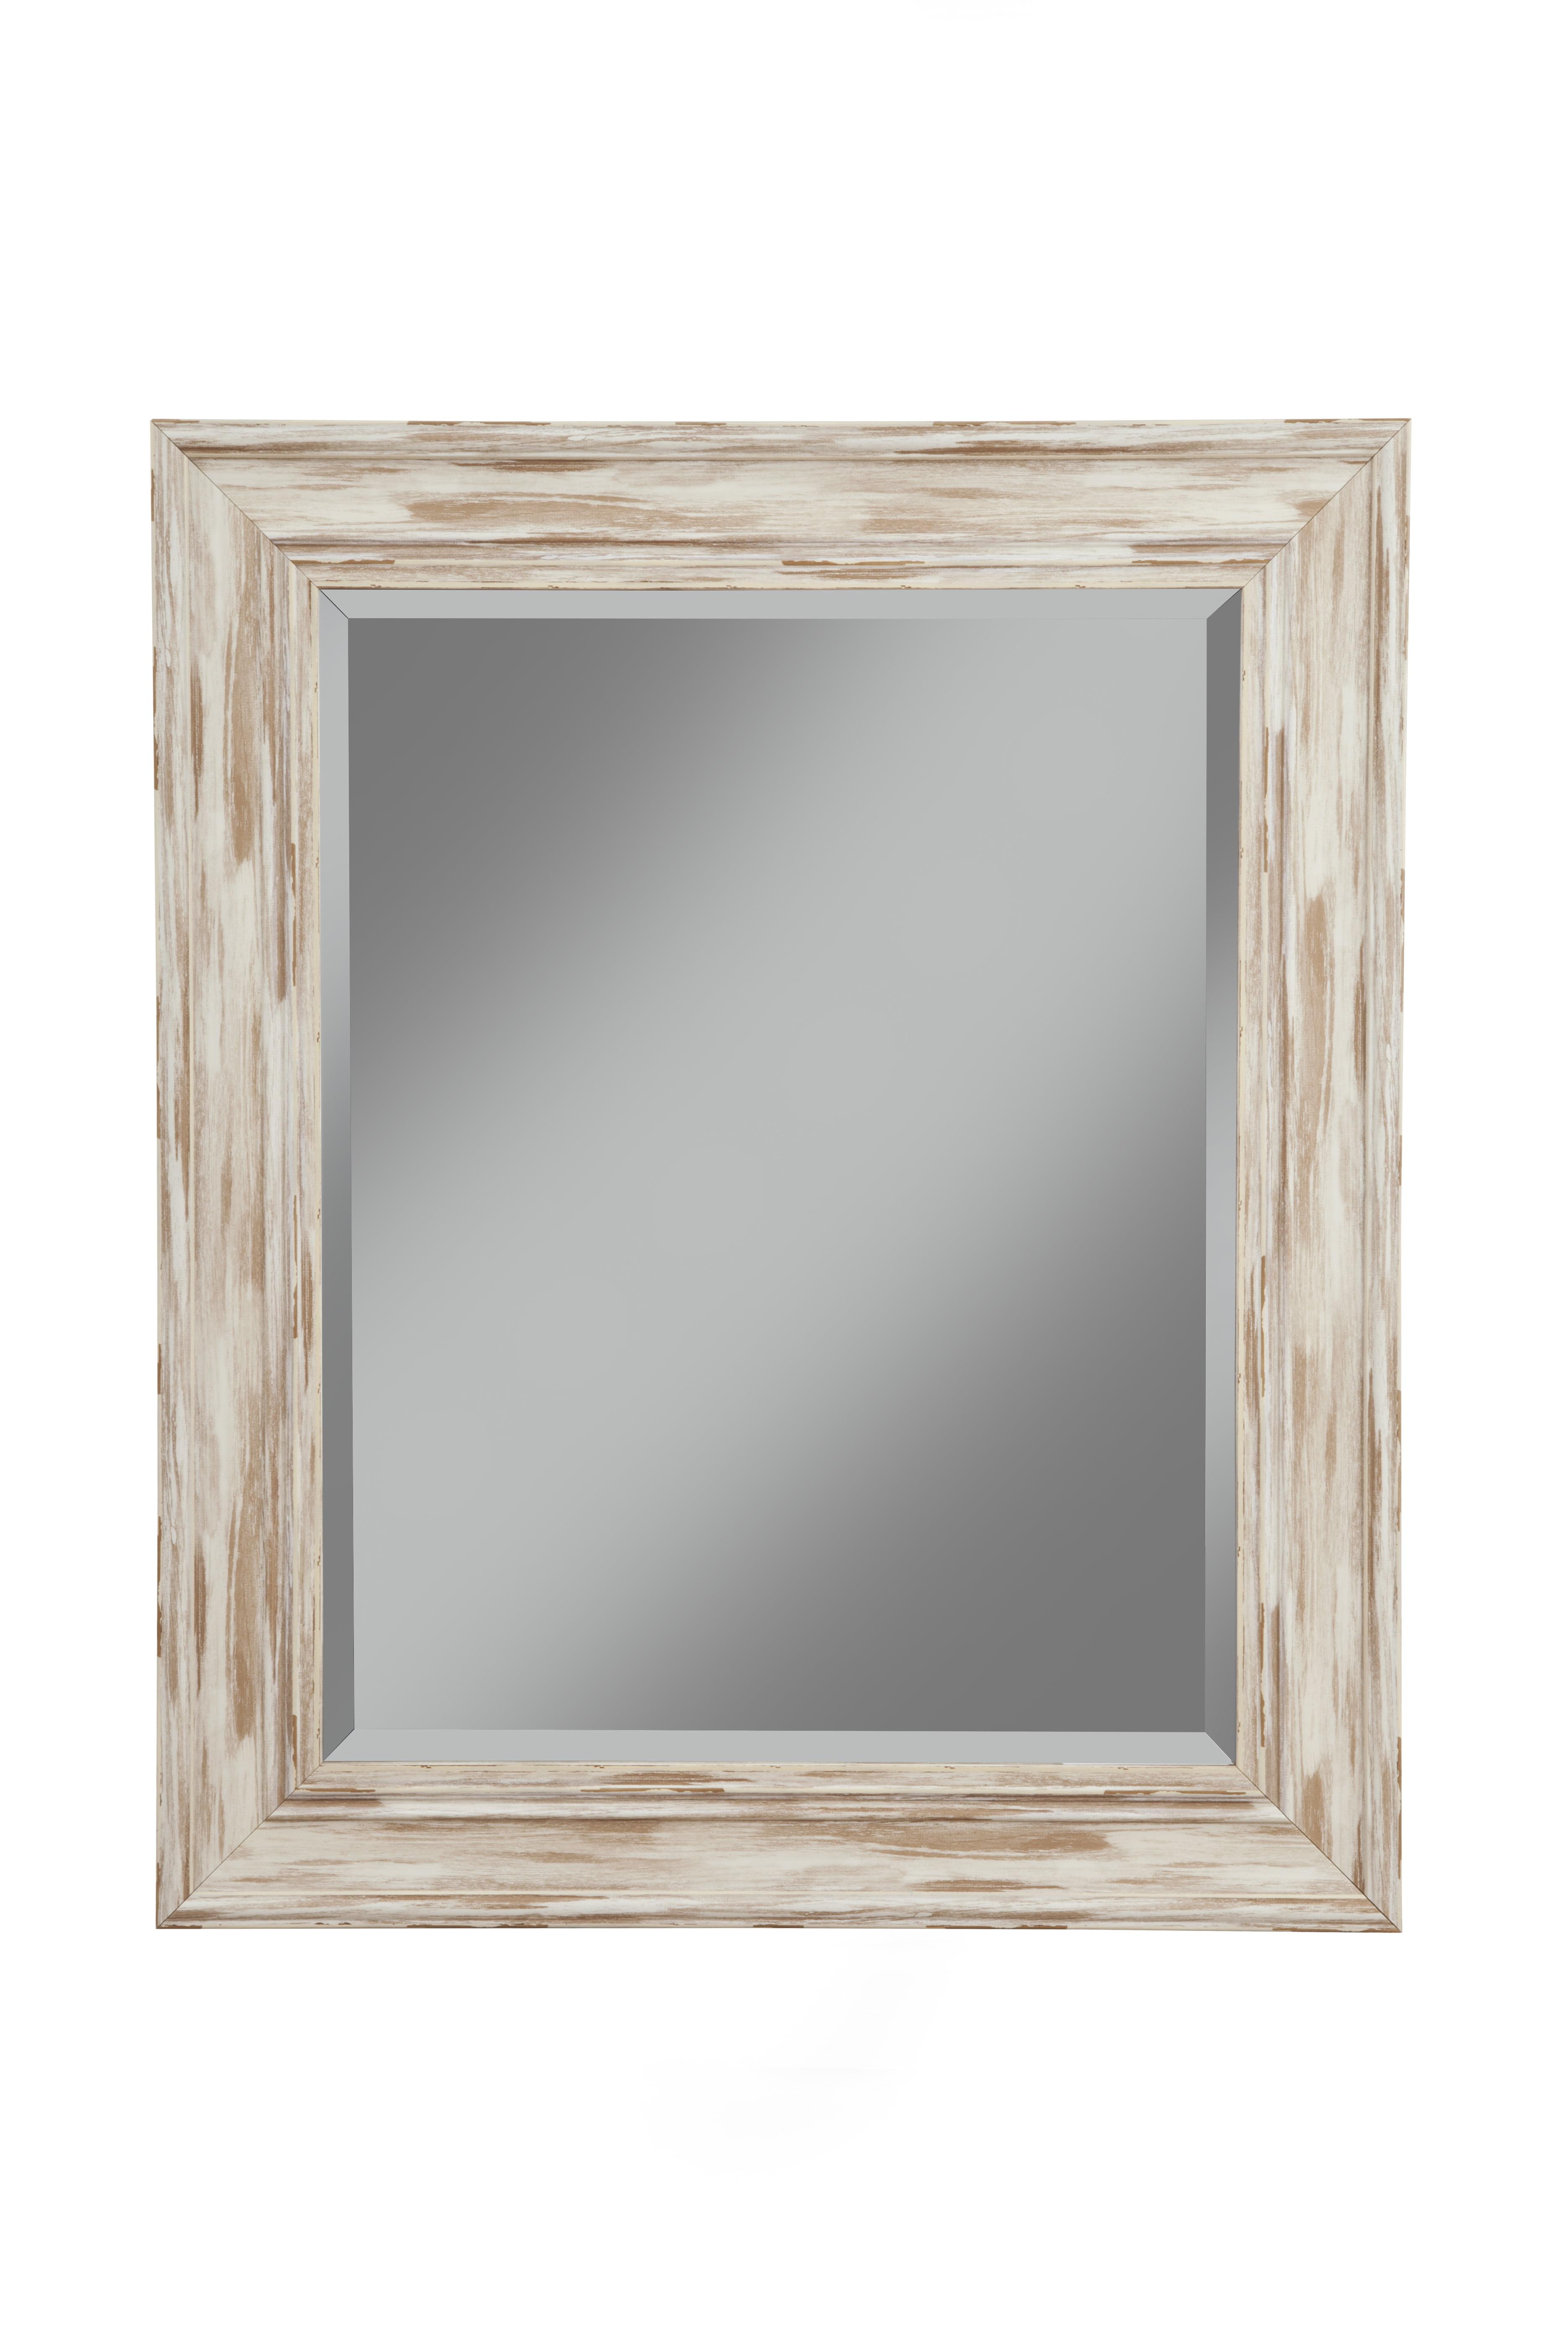 Farmhouse Antique White Wash Wall Mirror by Sandberg Furniture